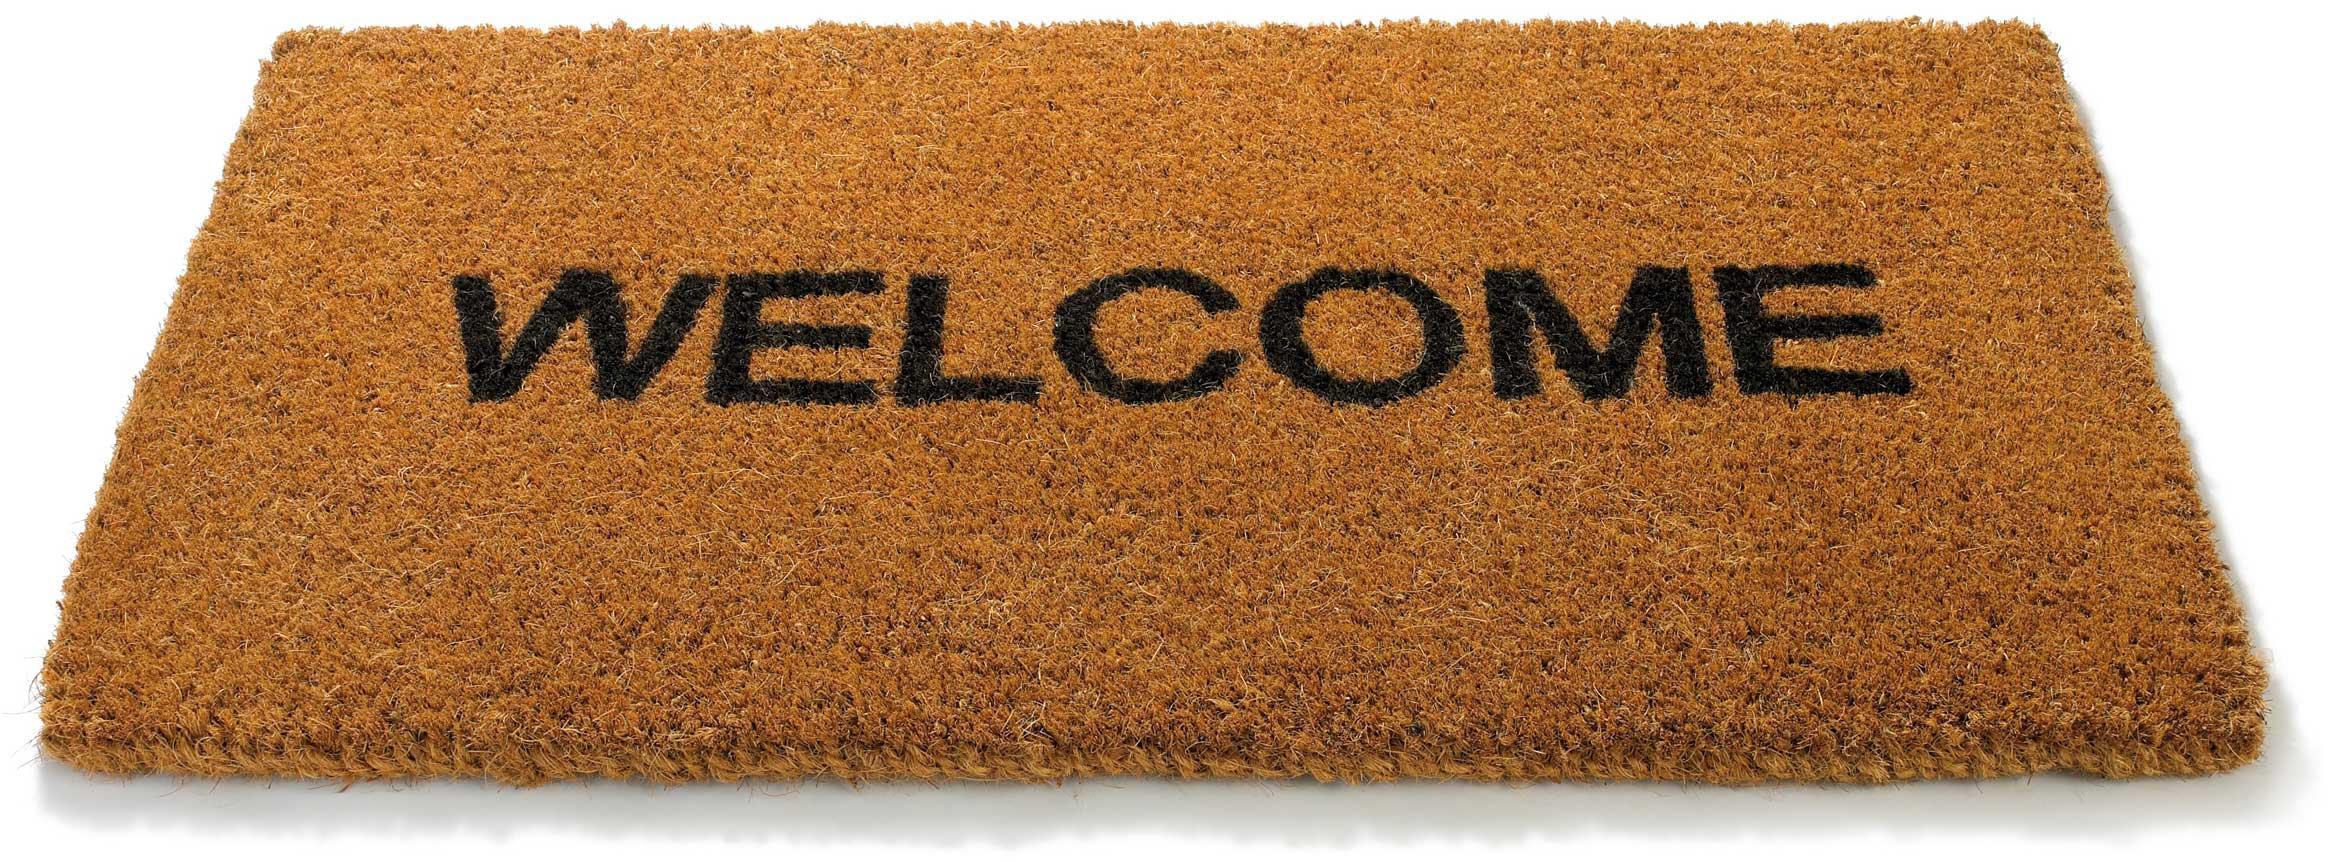 Brunswick-Crossing-welcome-mat-comp.jpg